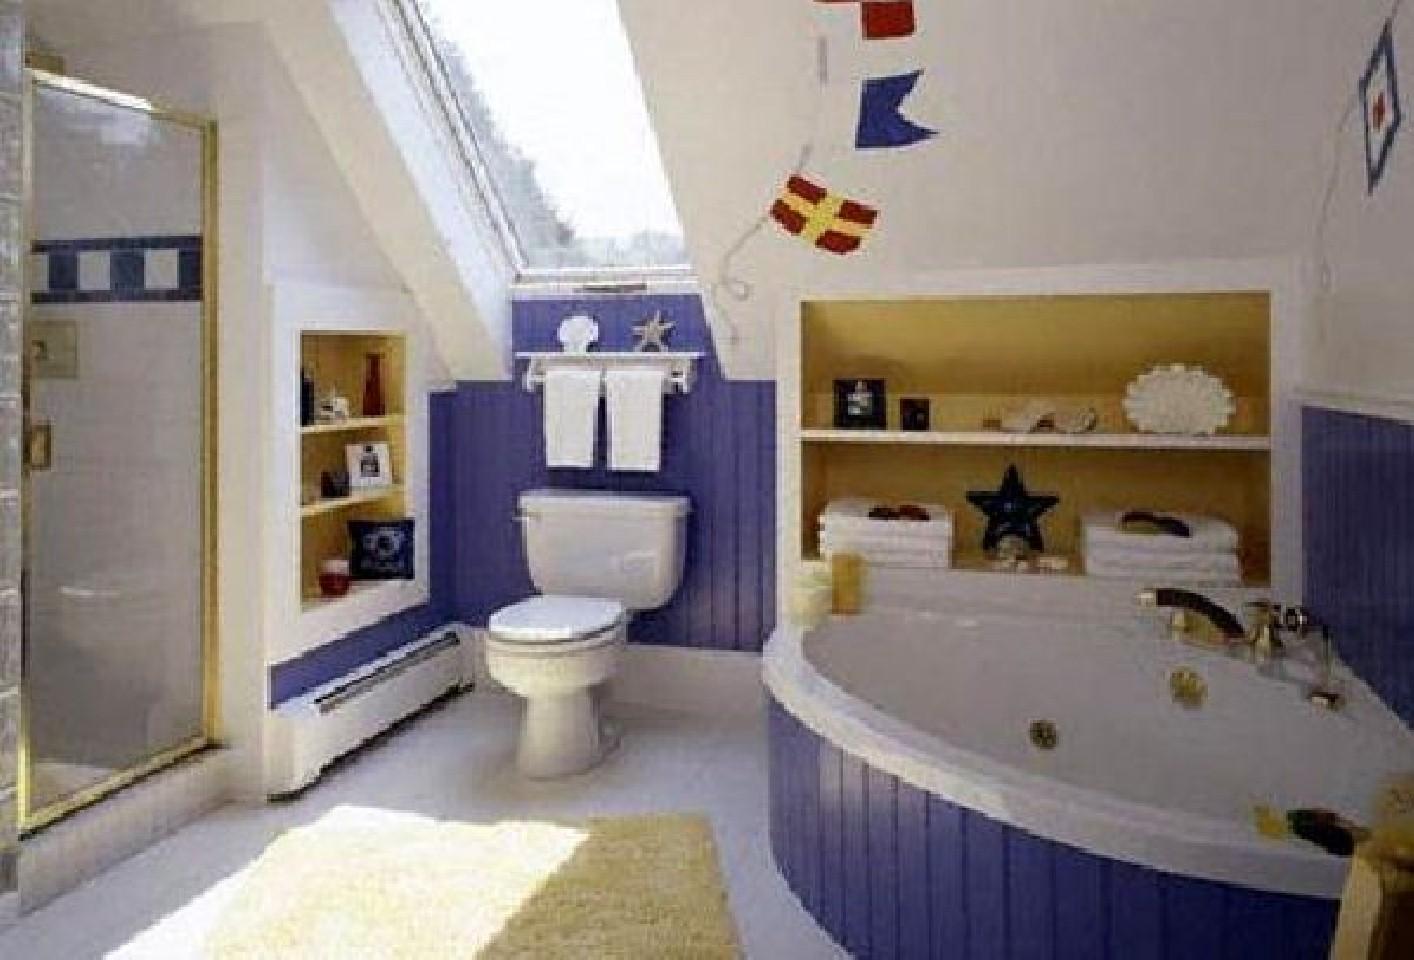 Free Download Children Bathroom On Makeover Ideas Best Make Over 1414x960 For Your Desktop Mobile Tablet Explore 49 Wallpaper Made Bathrooms Cheap Patterns